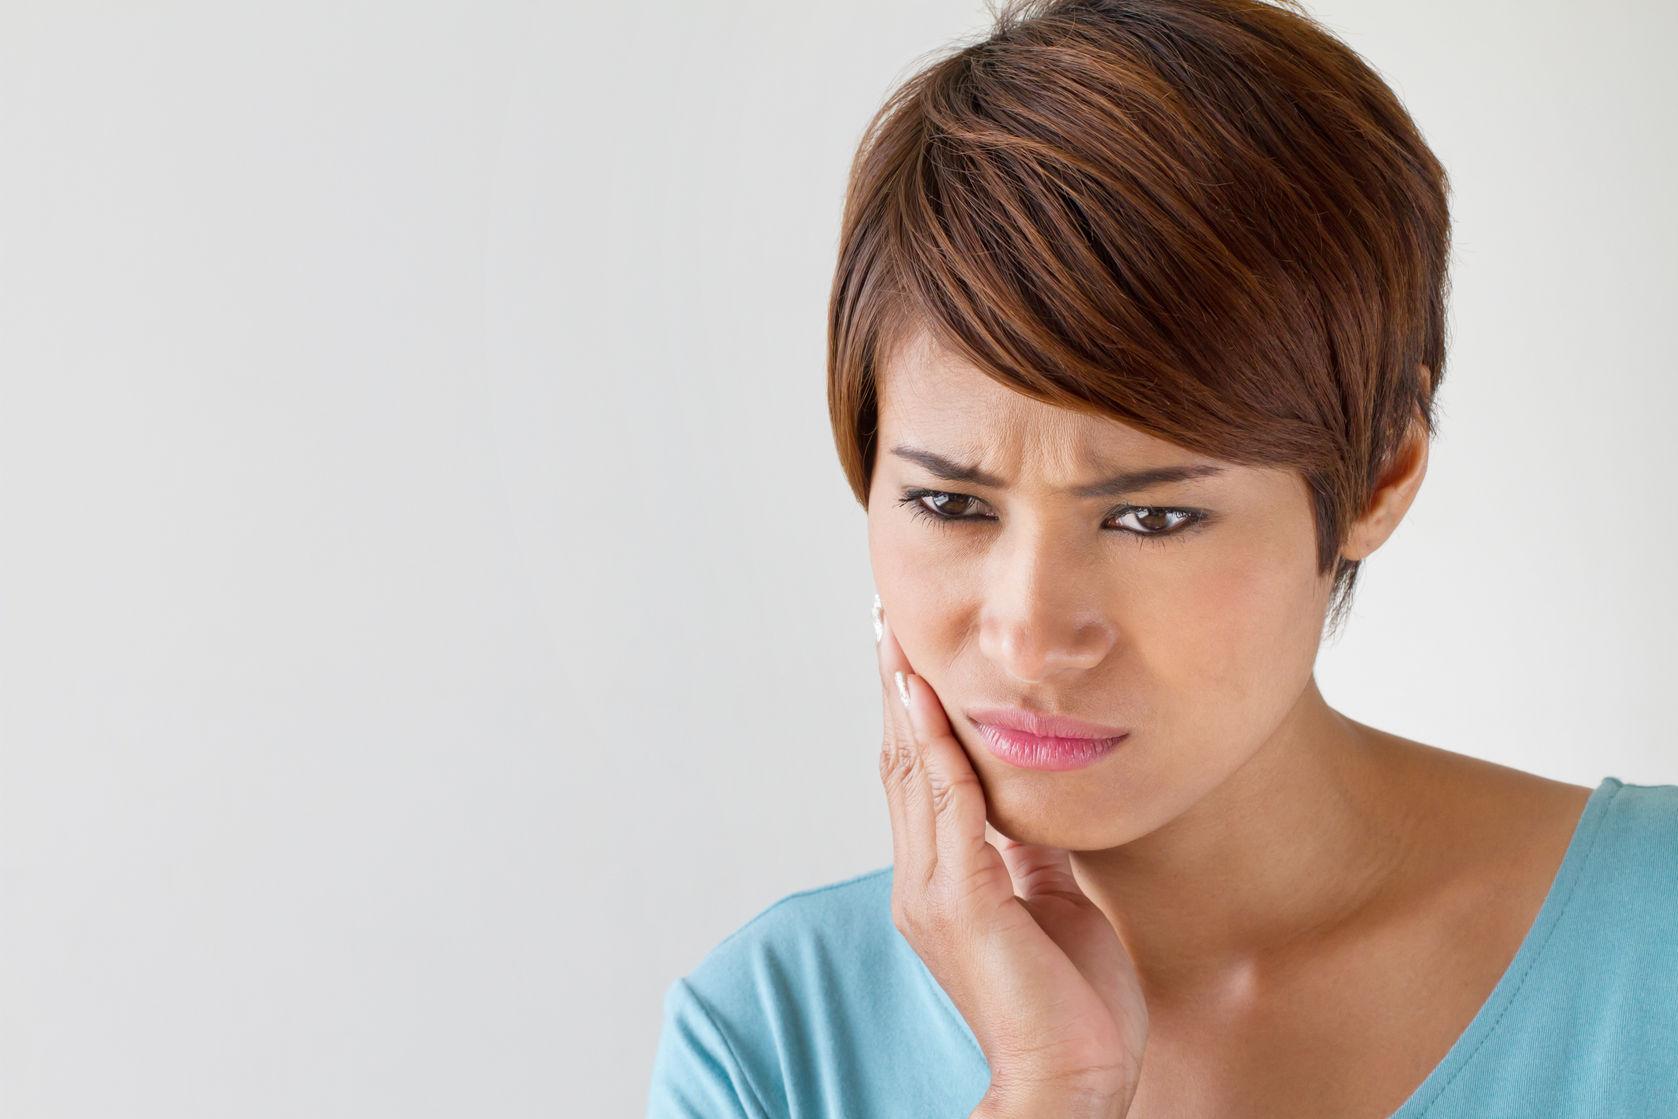 نتيجة بحث الصور عن home remedies for mouth ulcers in adults